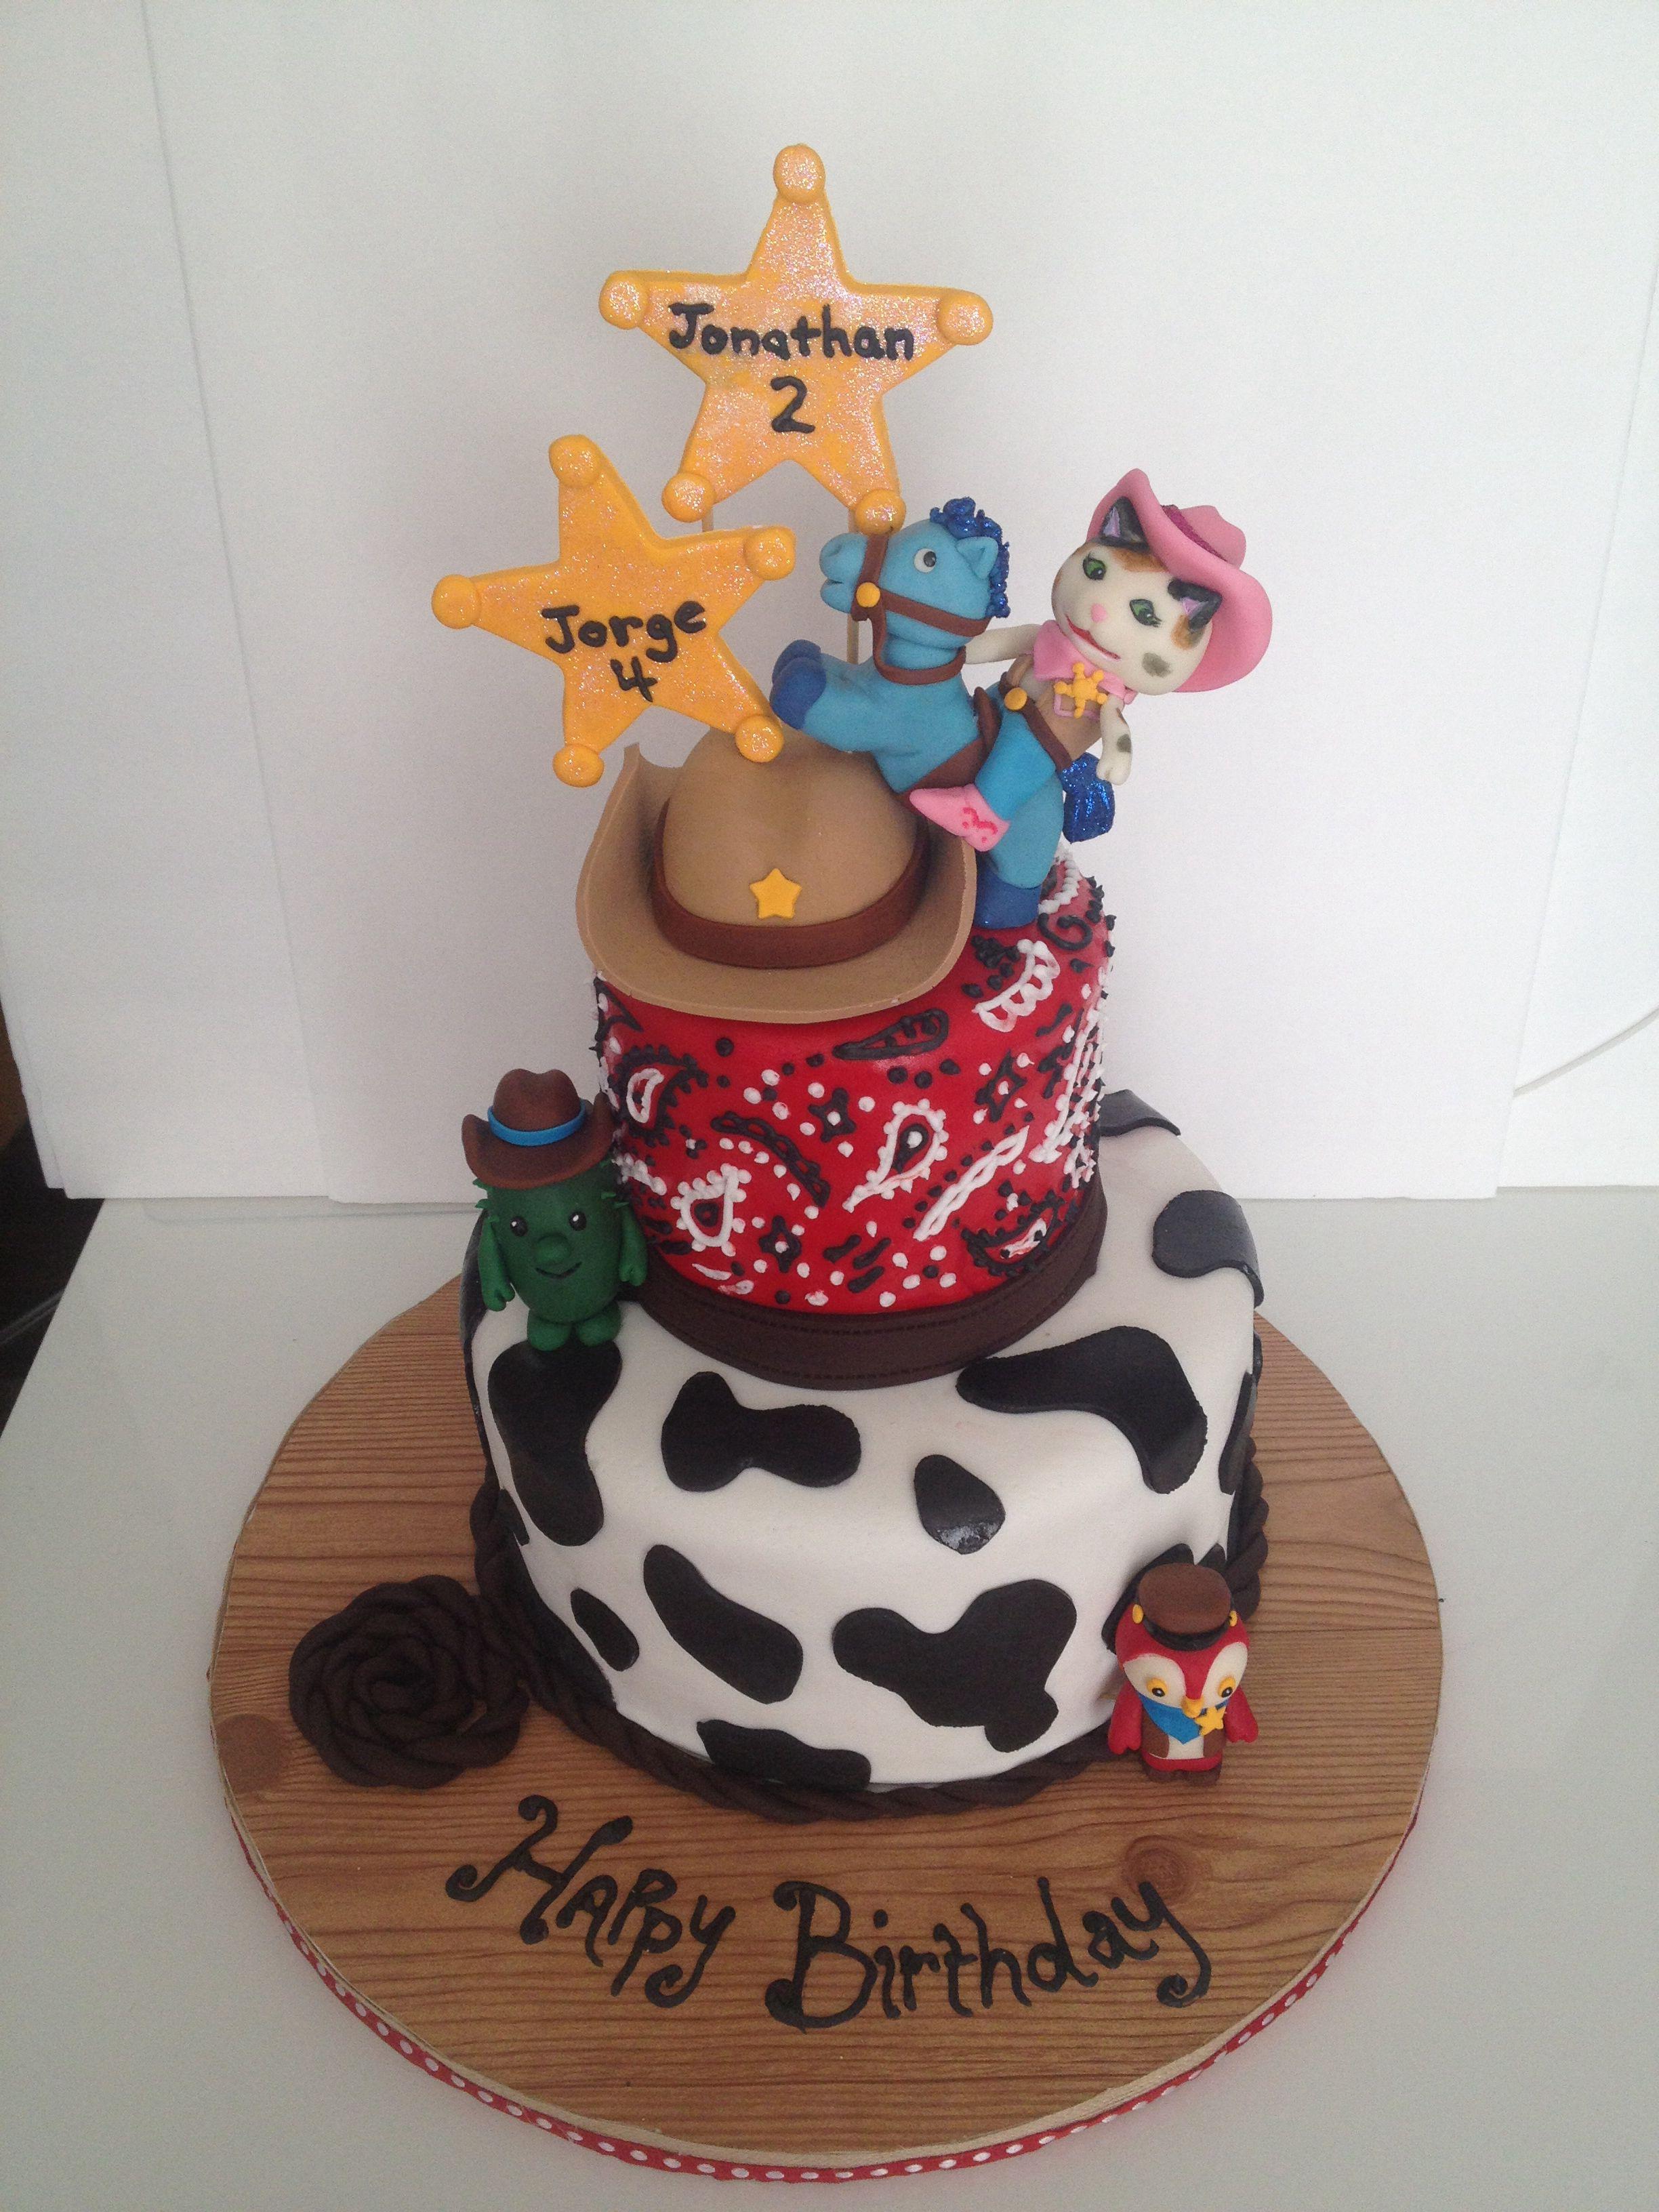 Jonathan And Jorges Sheriff Callie Cake Jorge Jonathan Birthday